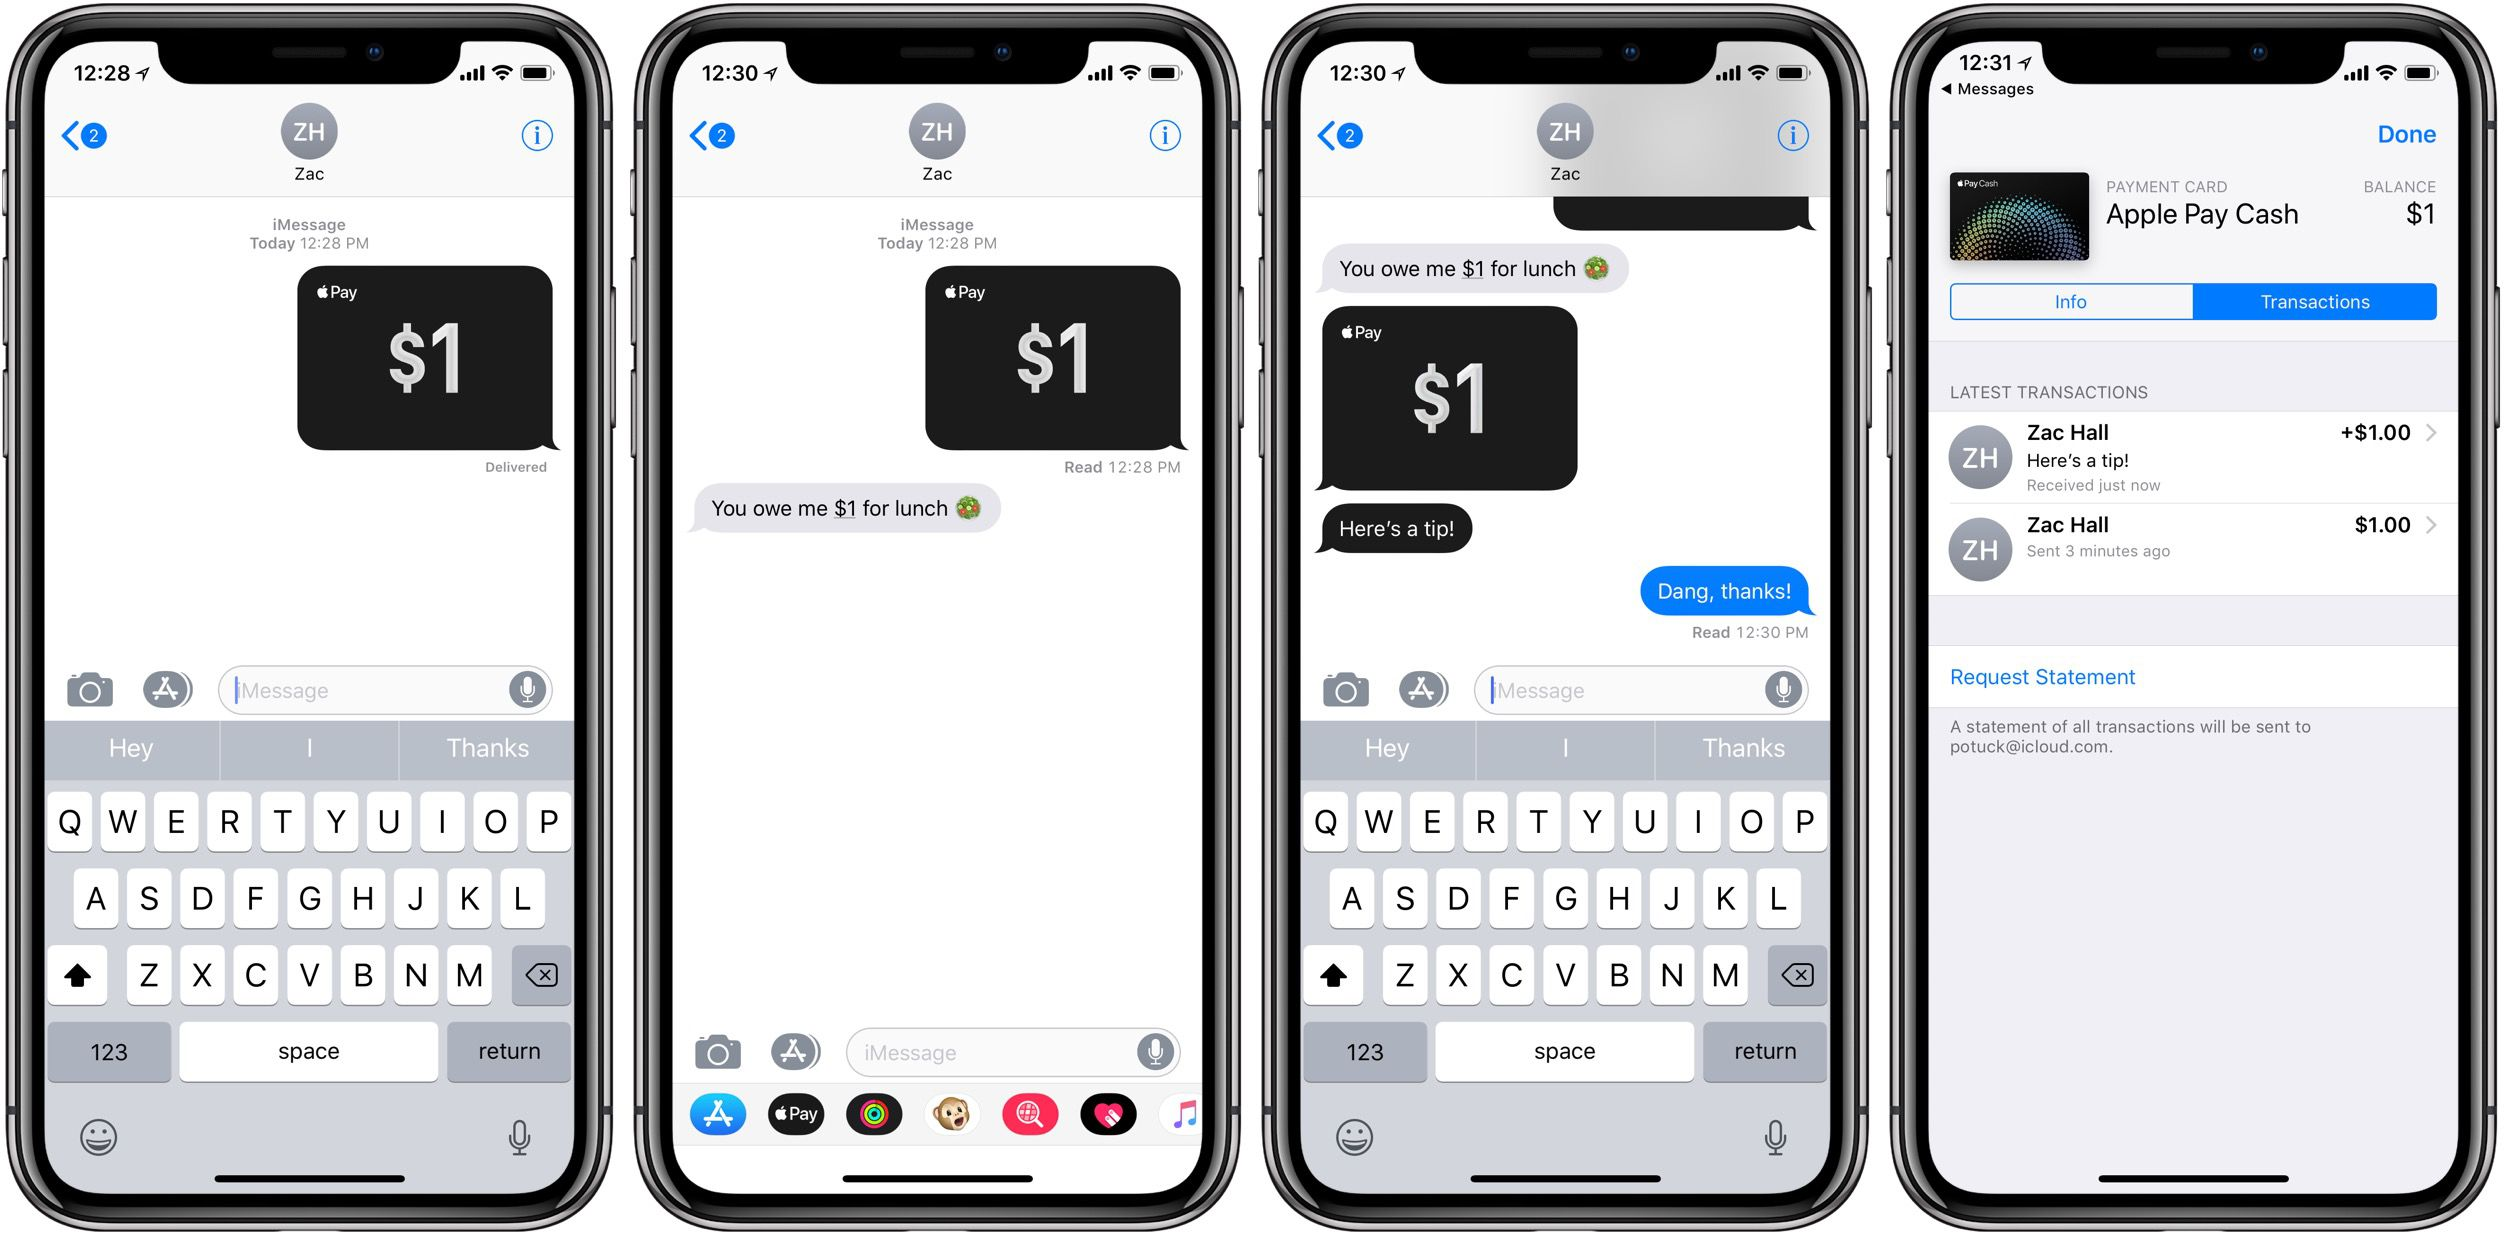 Apple Pay cash walkthrough 6